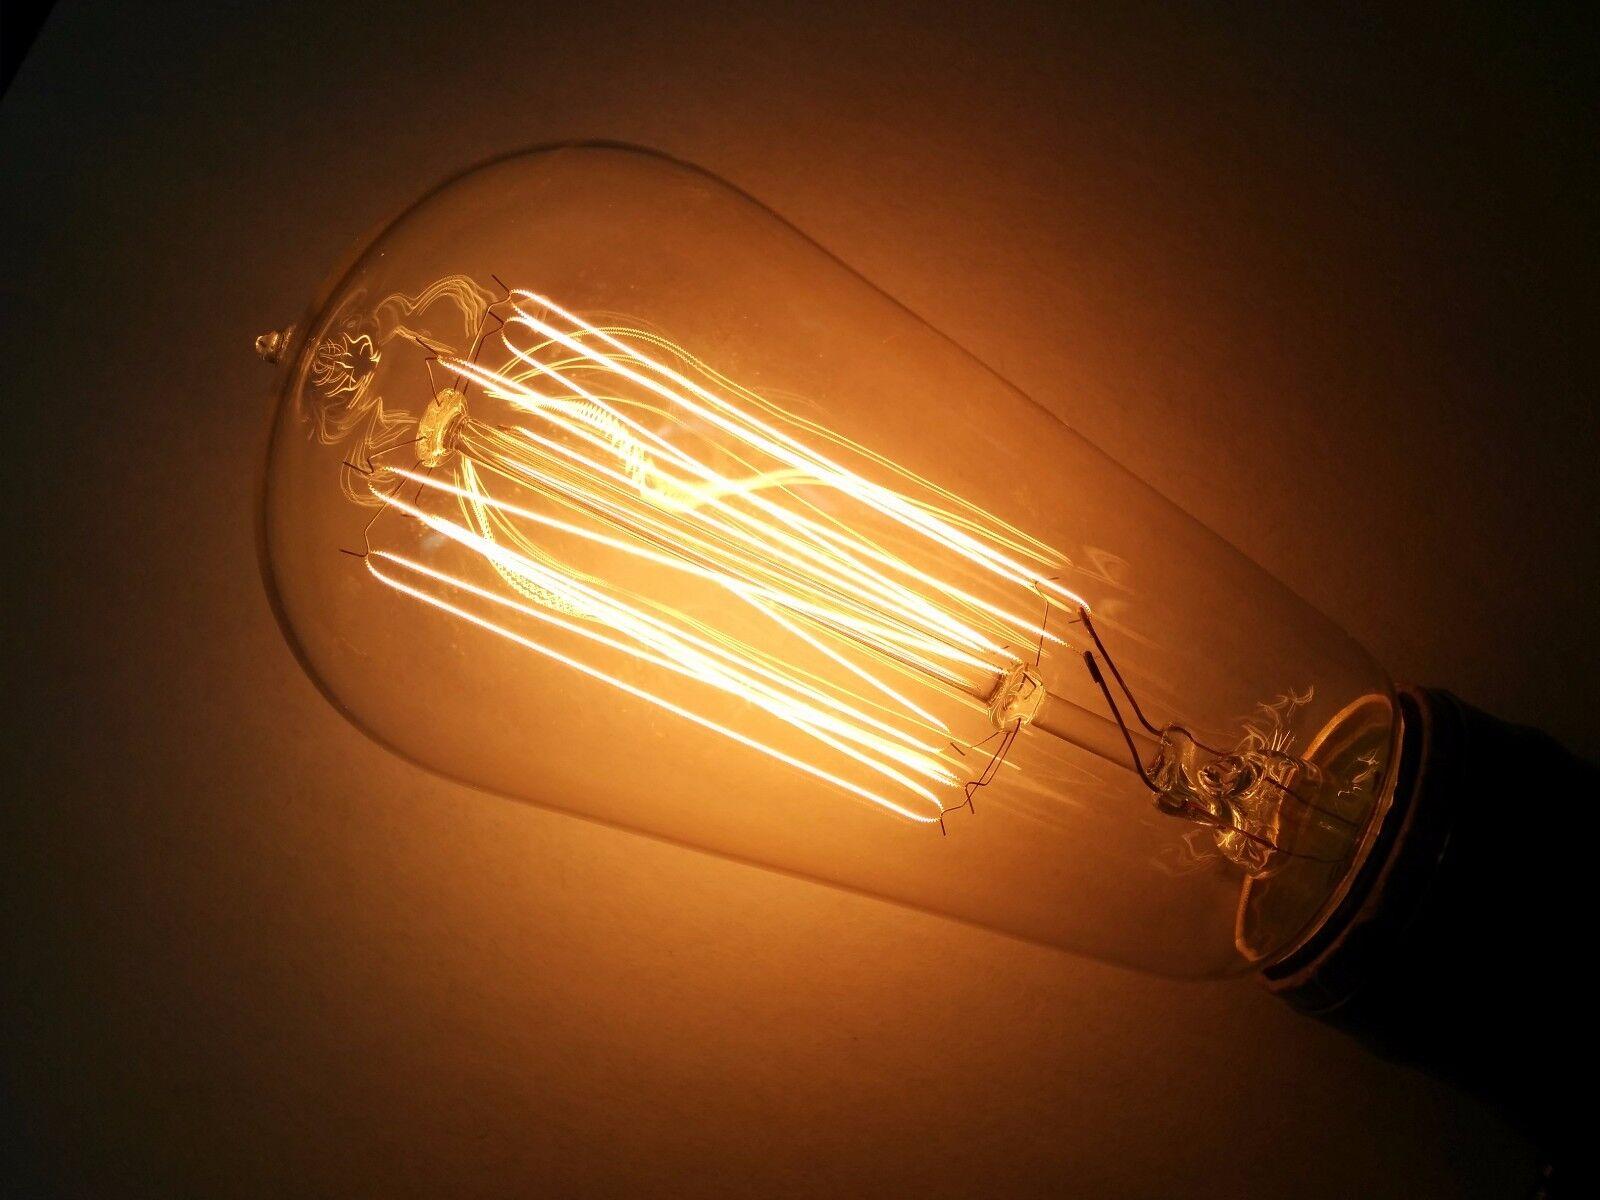 (10PK)Simple Vintage ST58 Edison Light Bulb 40W 120V Antique Squirrel Cage Clear